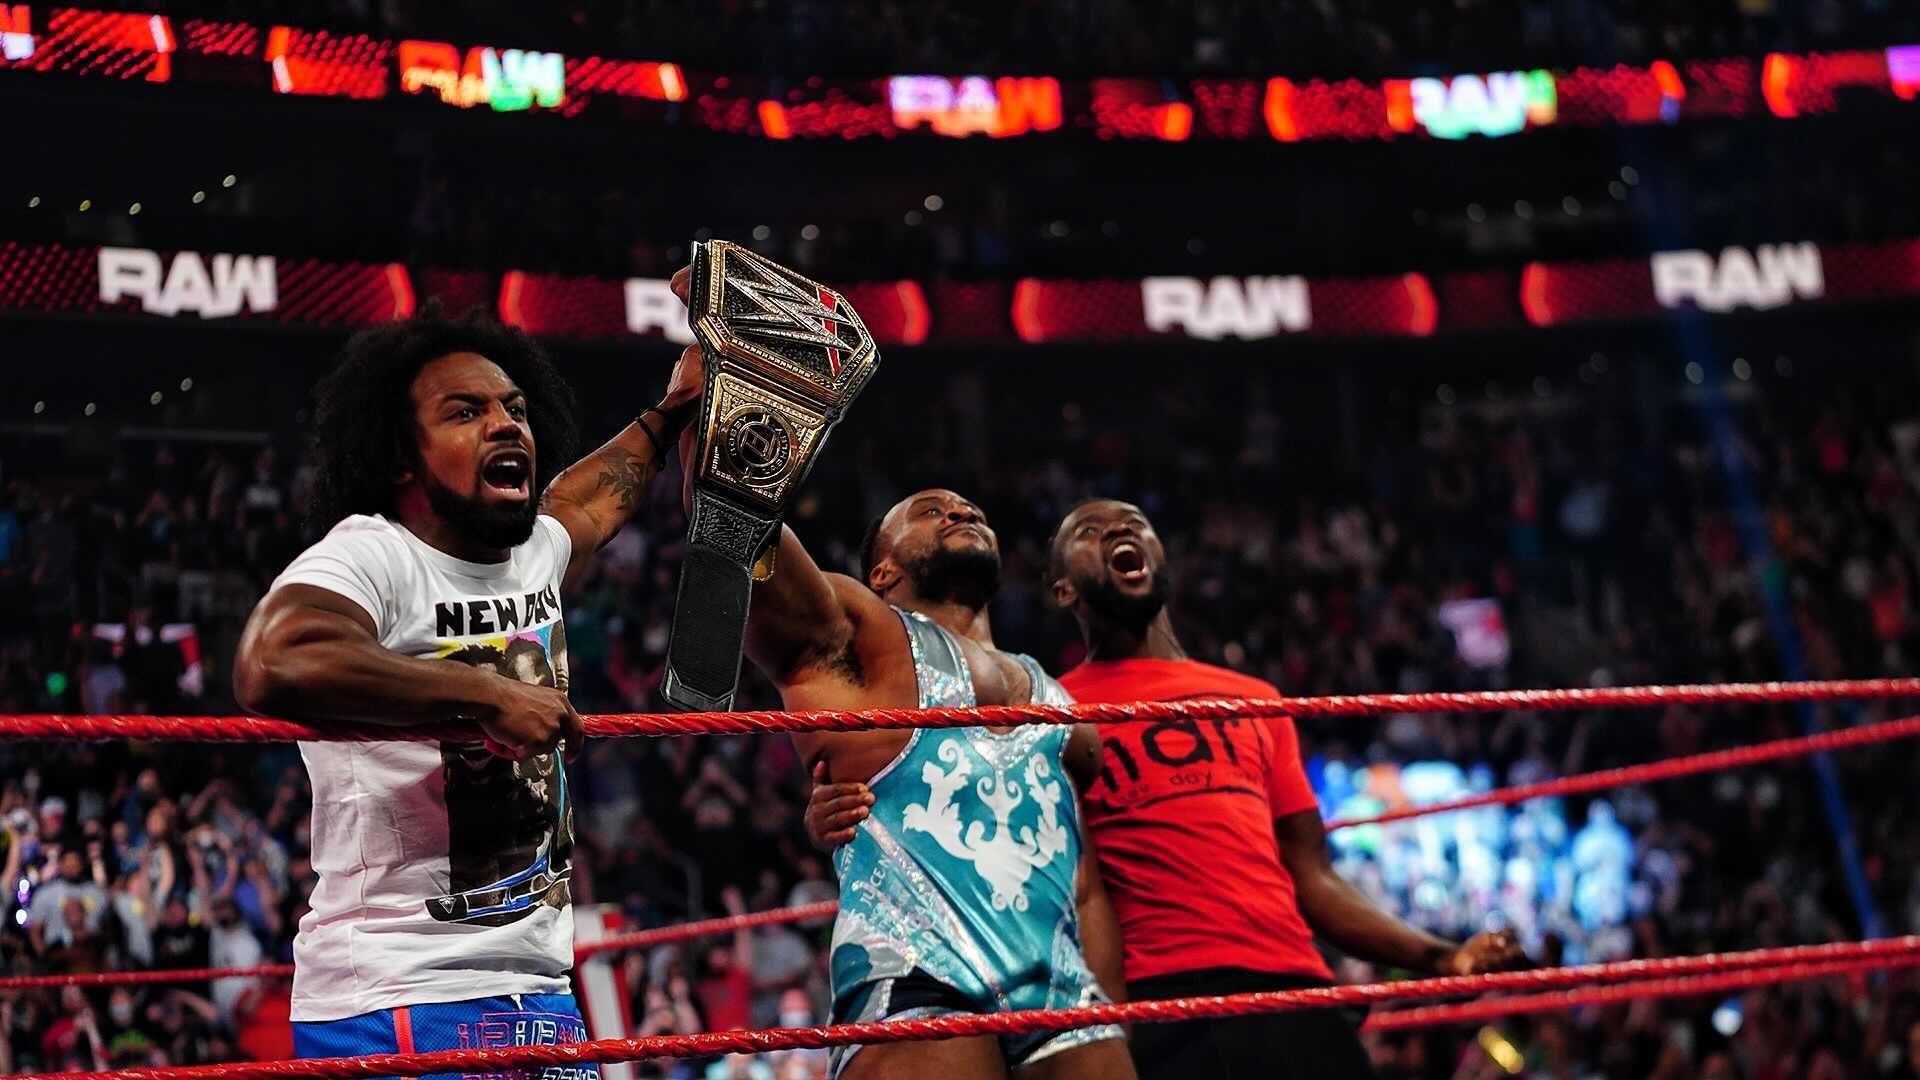 WWE Draft 2021 Confirmed To Return In October 2